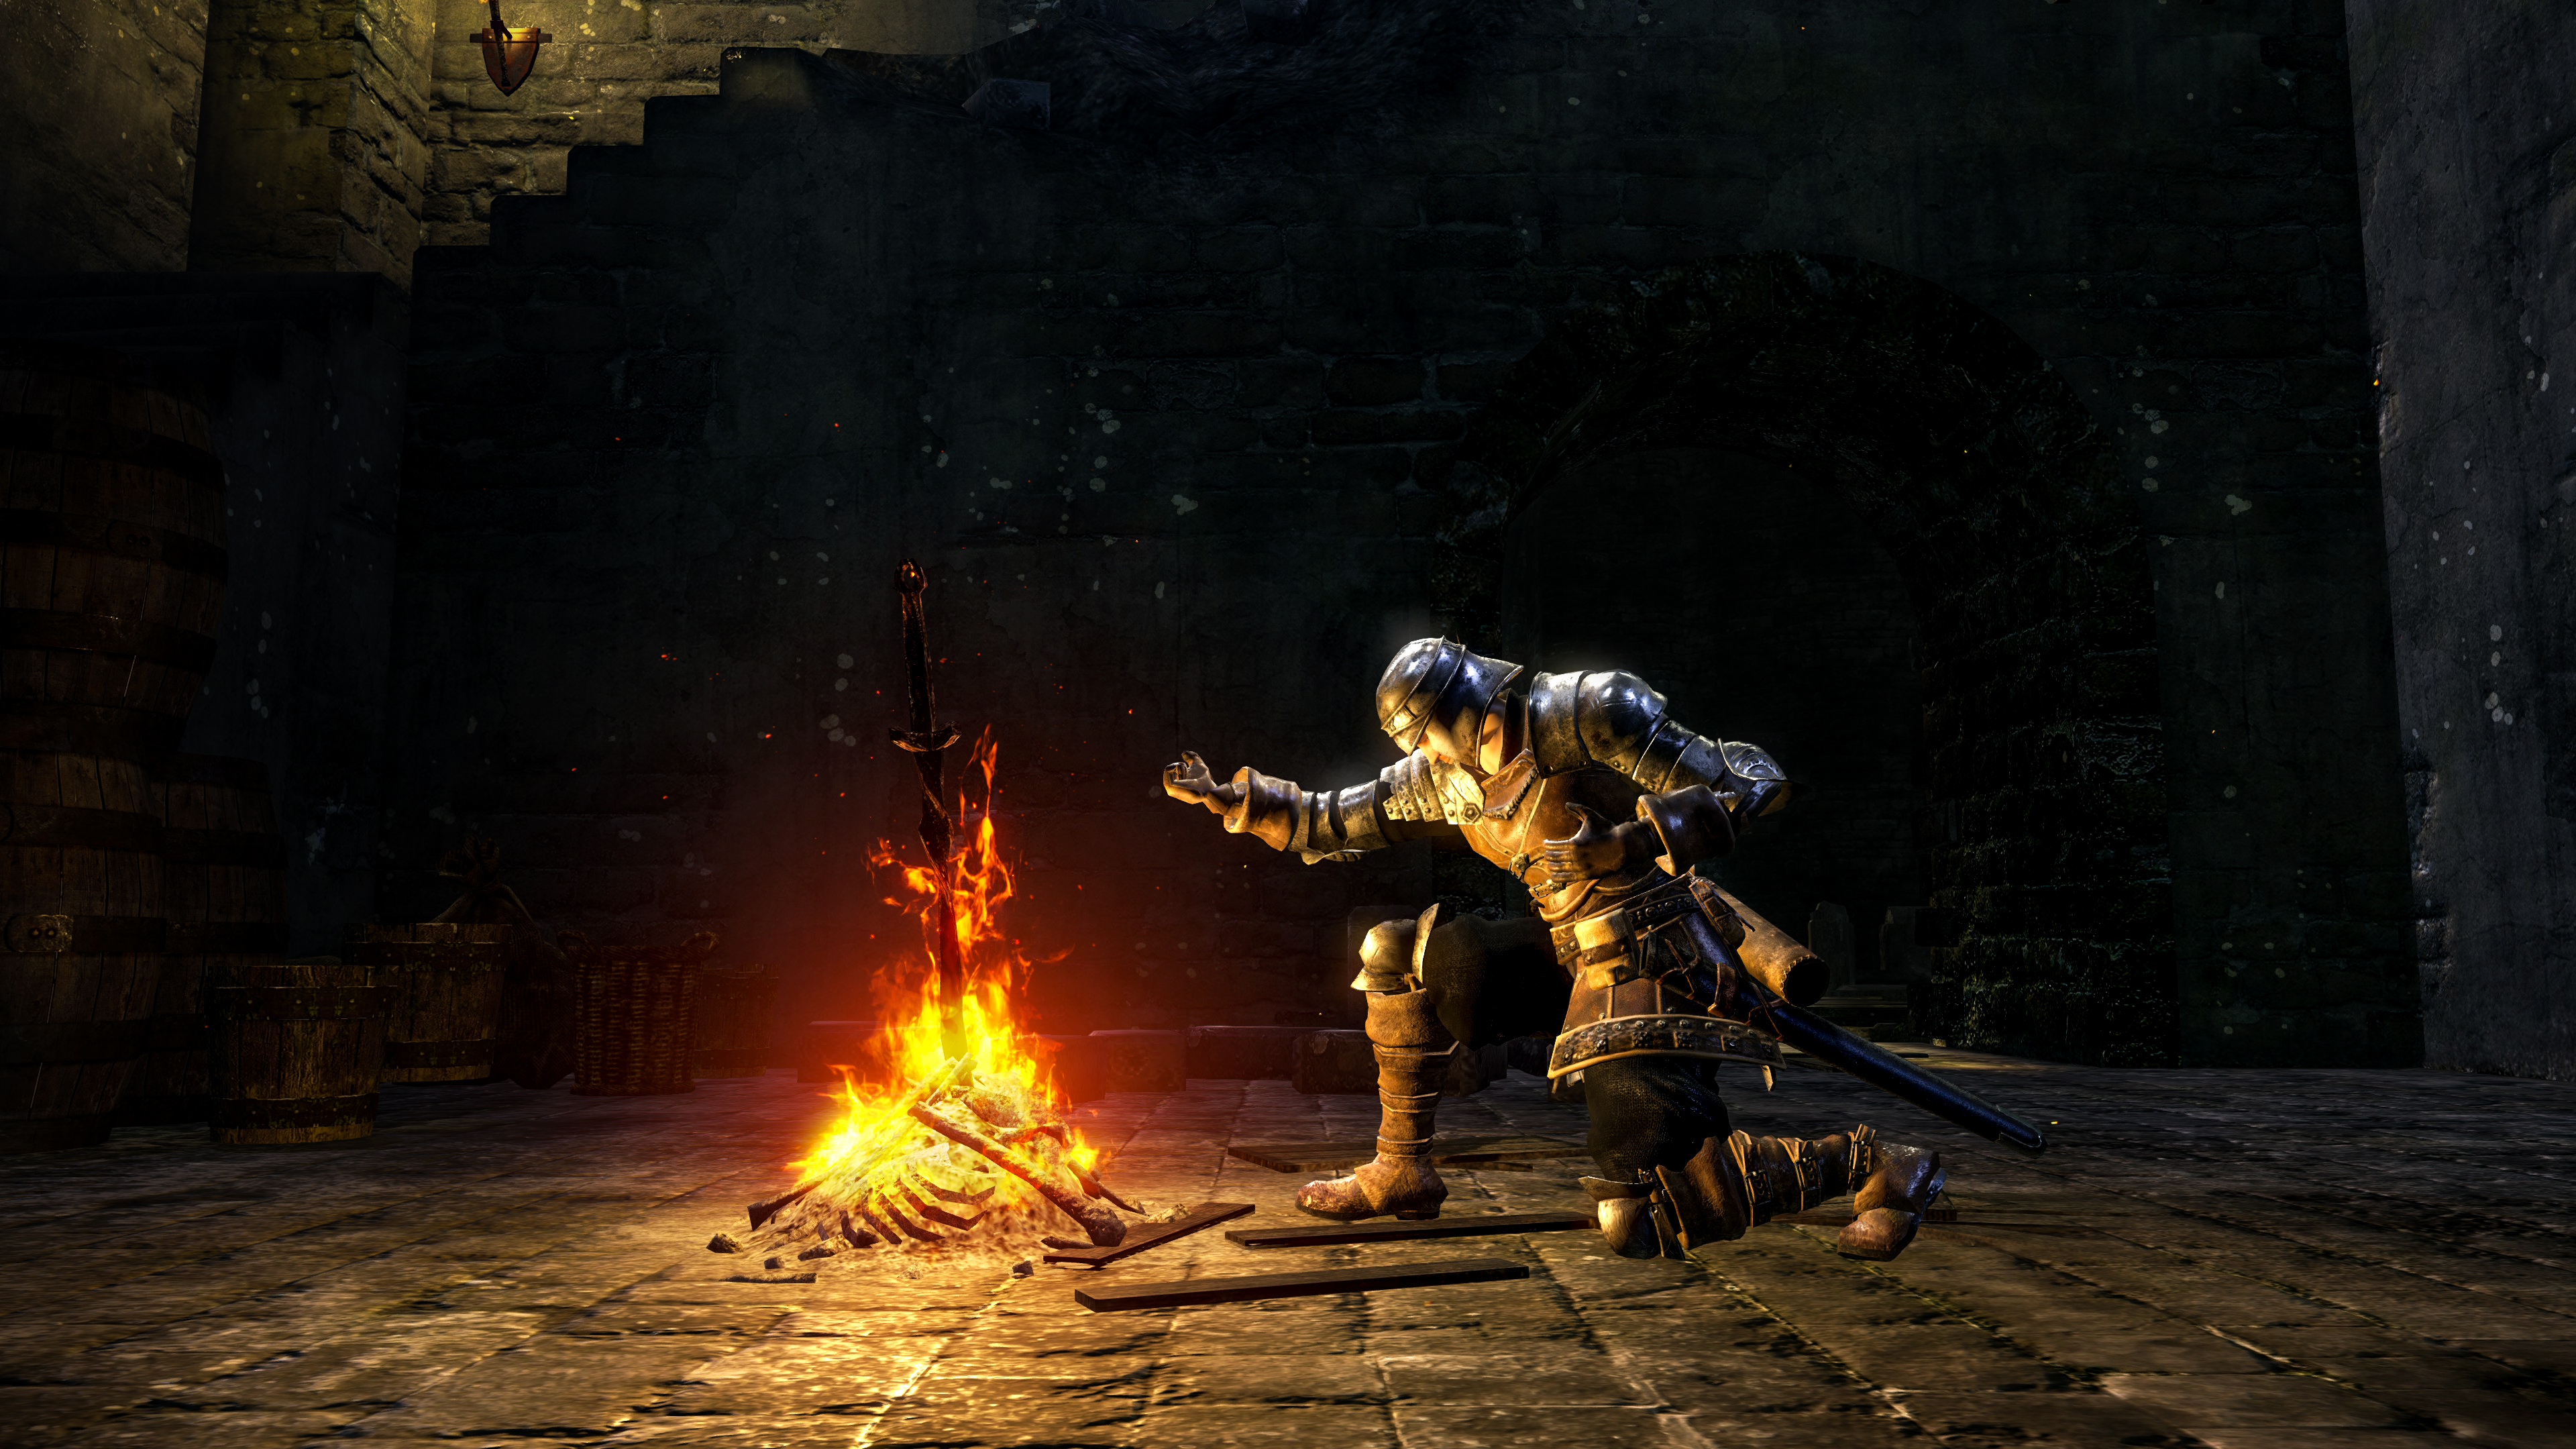 Dark Souls Remastered 4k, HD Games, 4k Wallpapers, Images